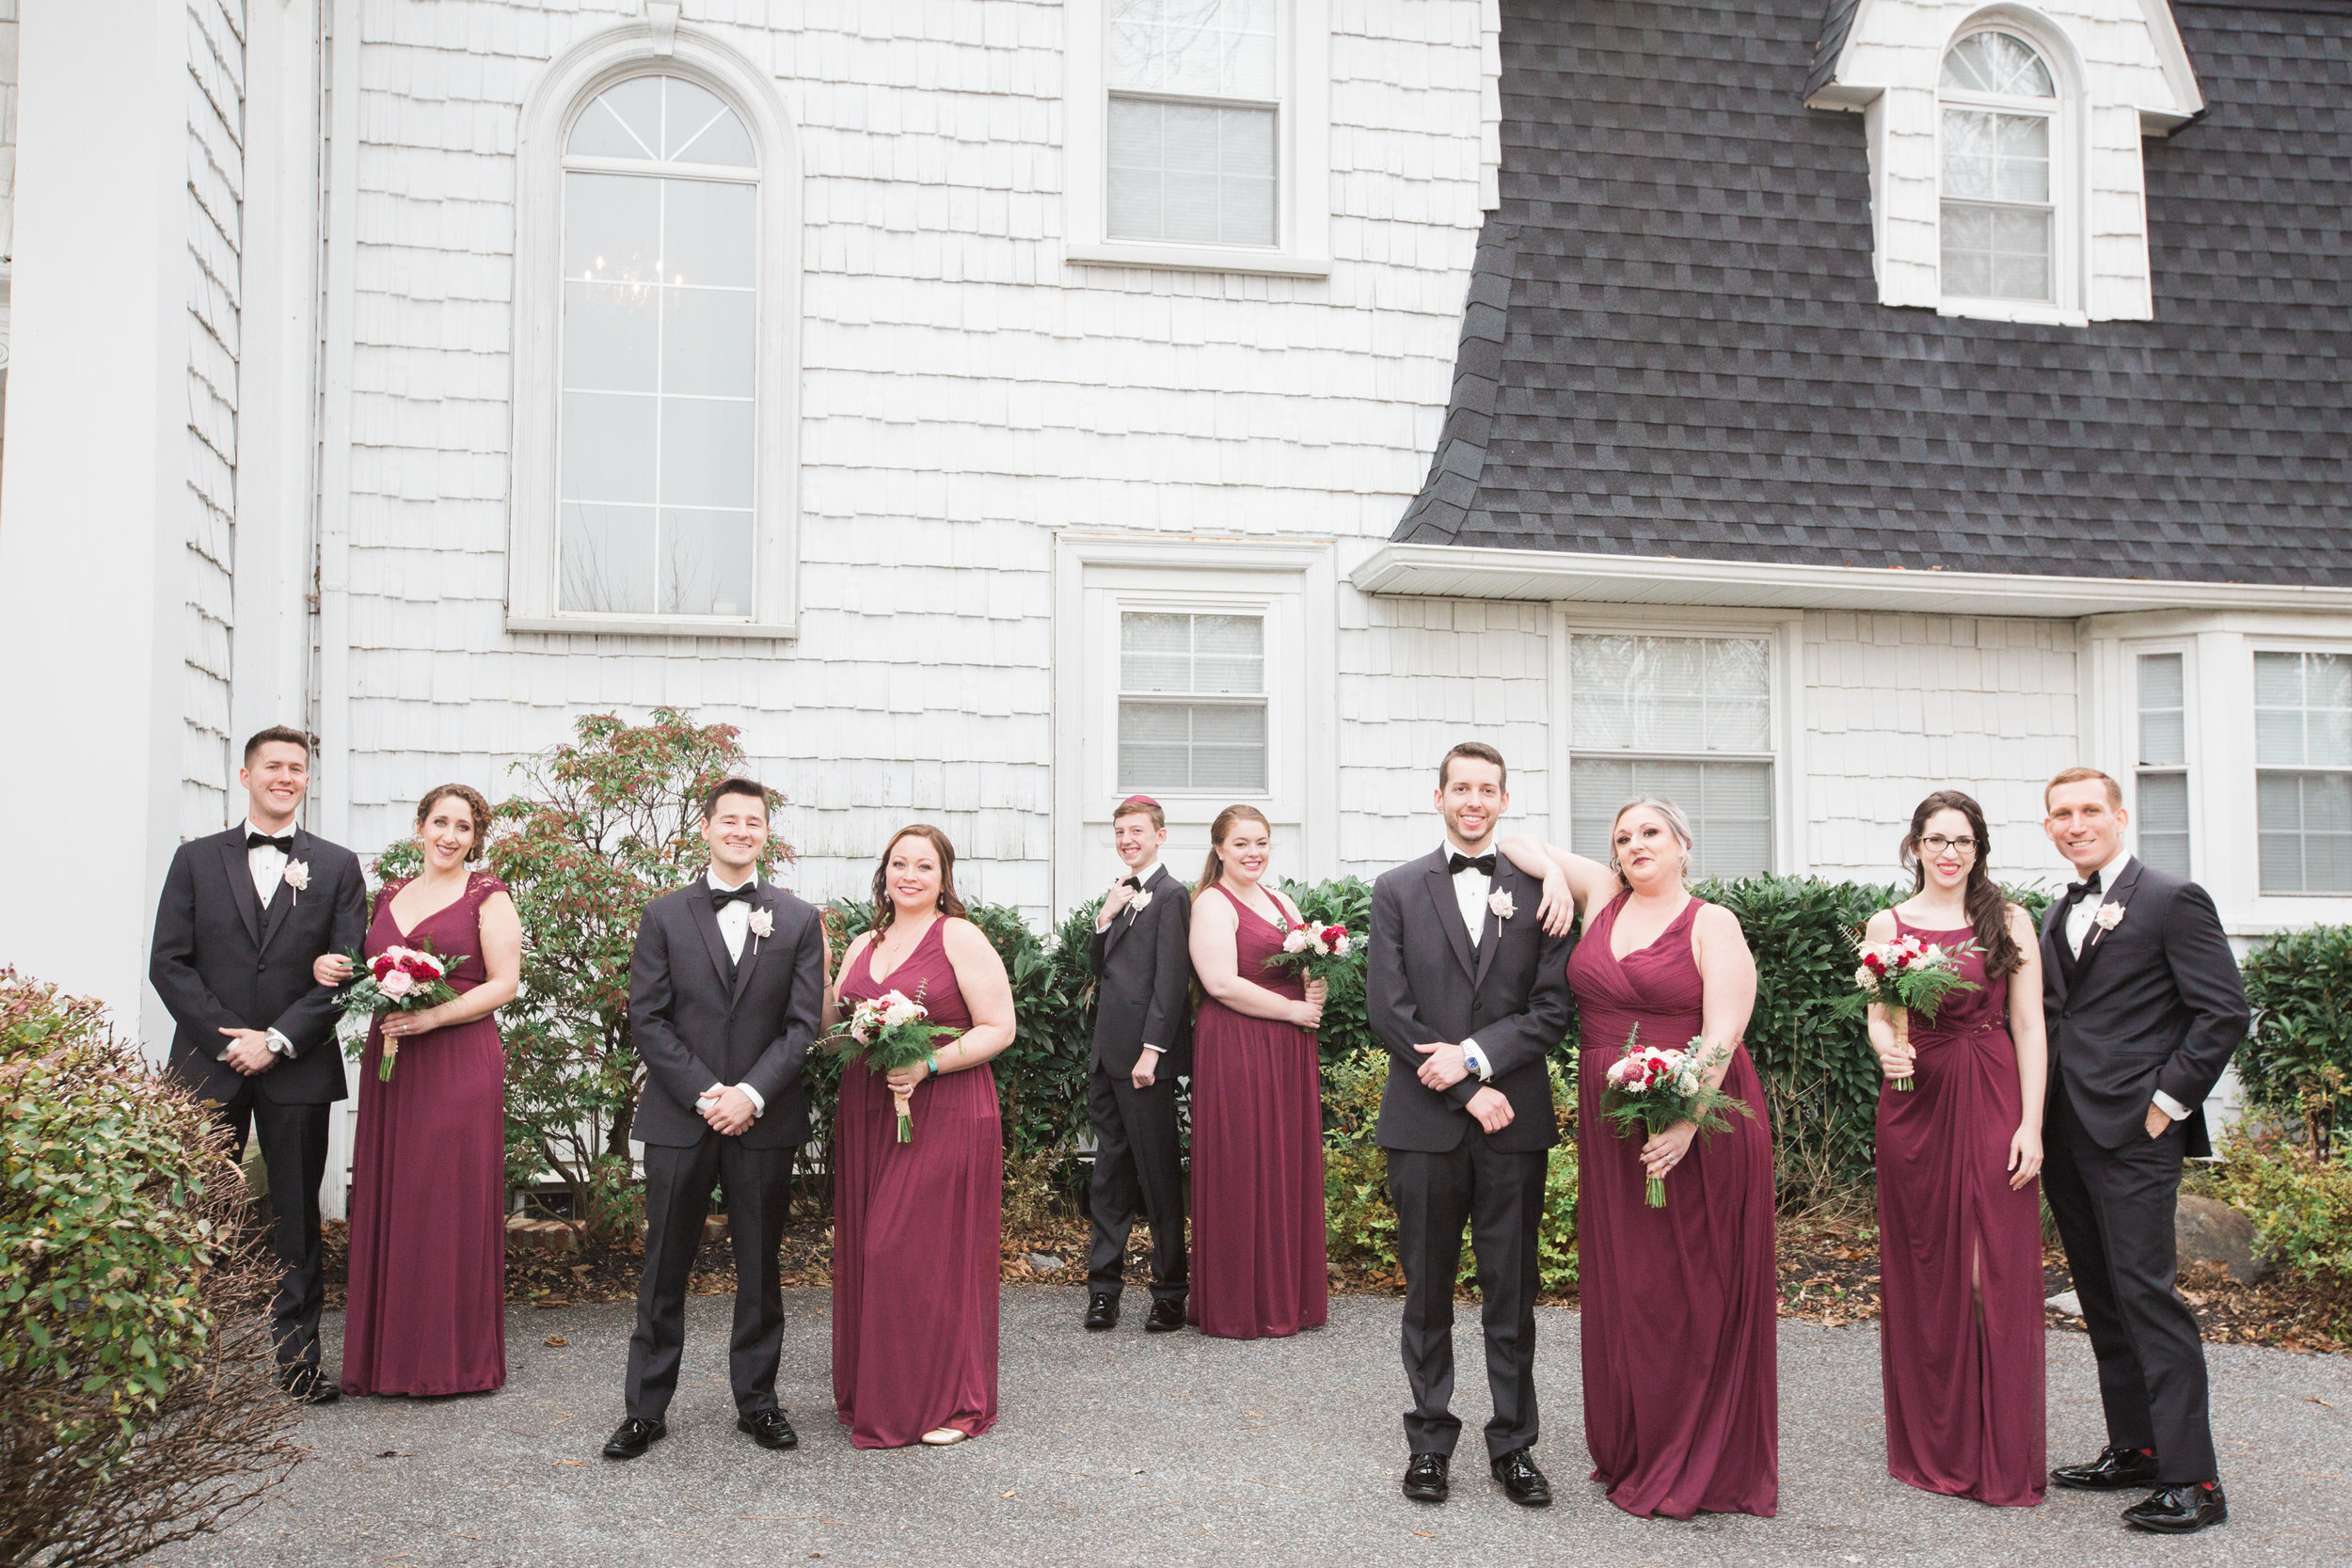 Harry Potter Wedding at Overhills Mansion Catonville Maryland Wedding Photographers Megapixels Media (54 of 134).jpg